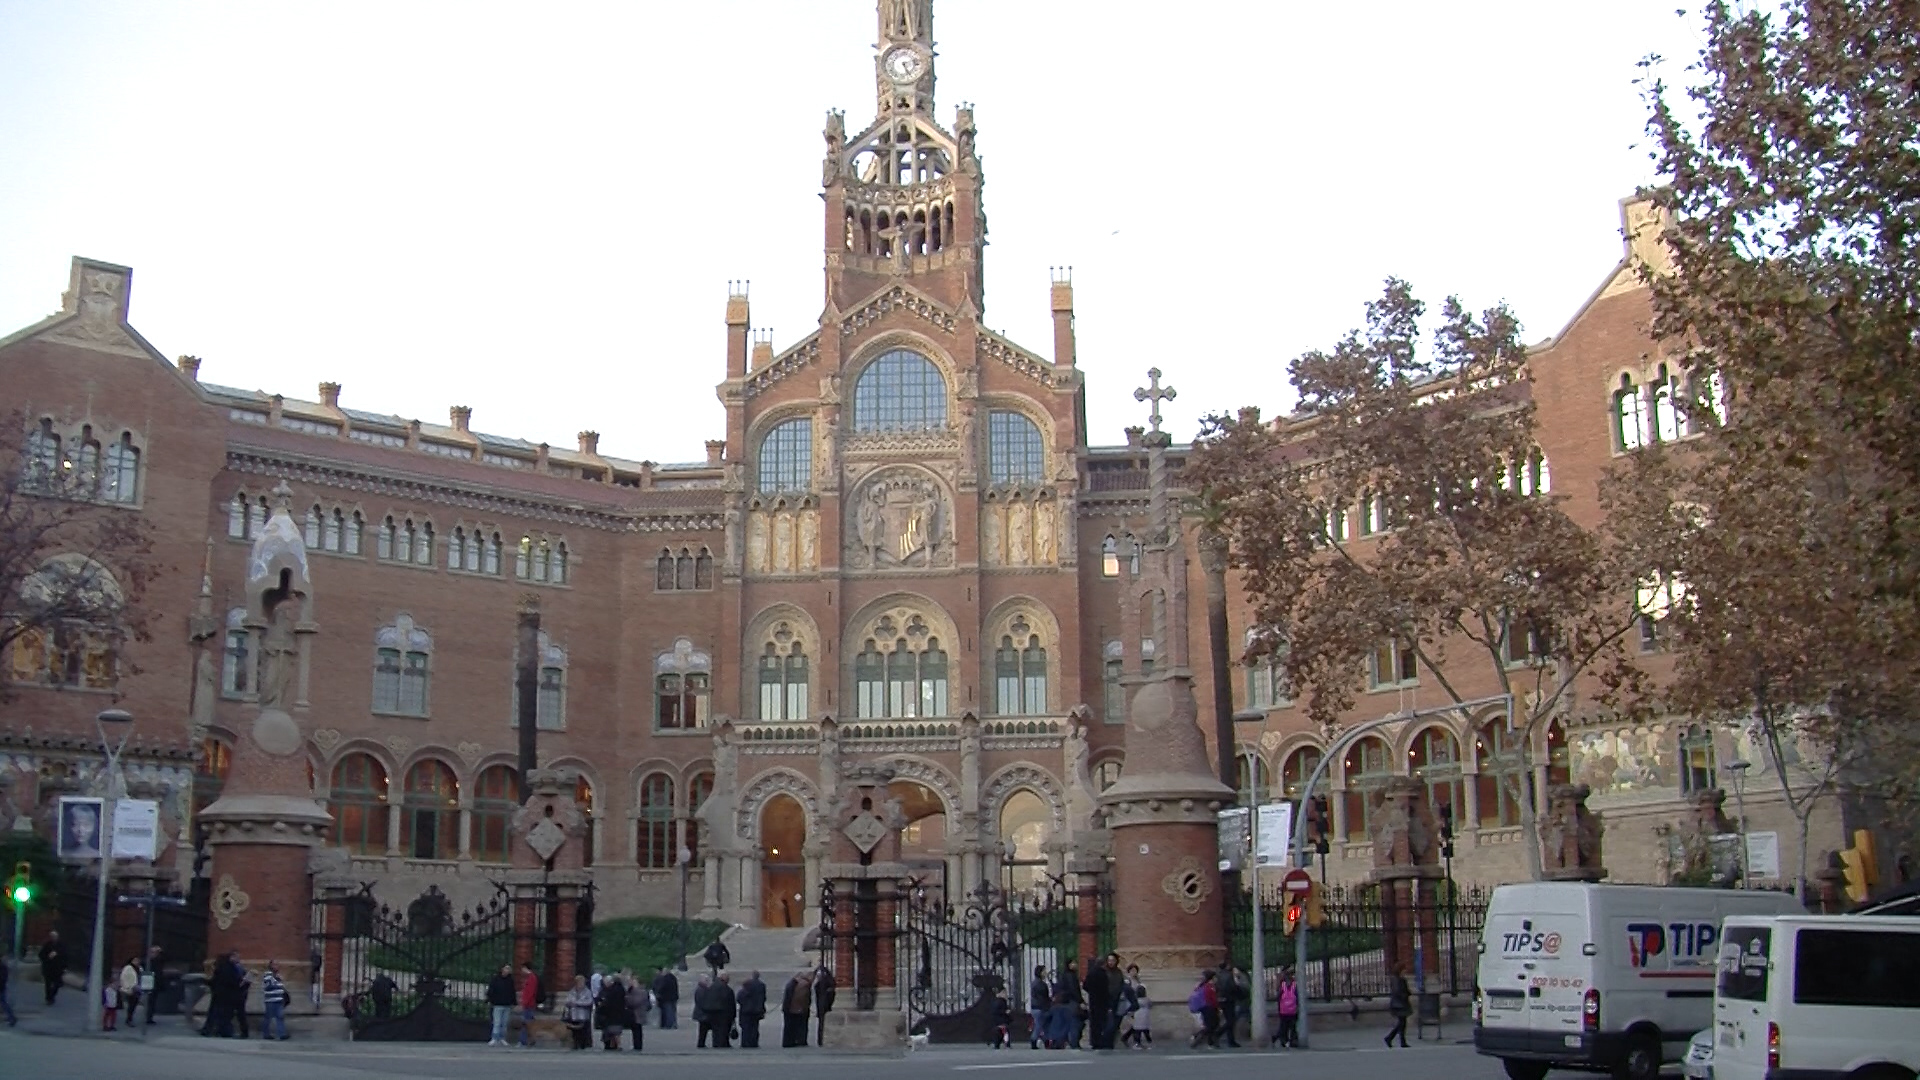 1a. Presentació Fira Oli 2016 al Recinte Modernista de Sant Pau a Barcelona